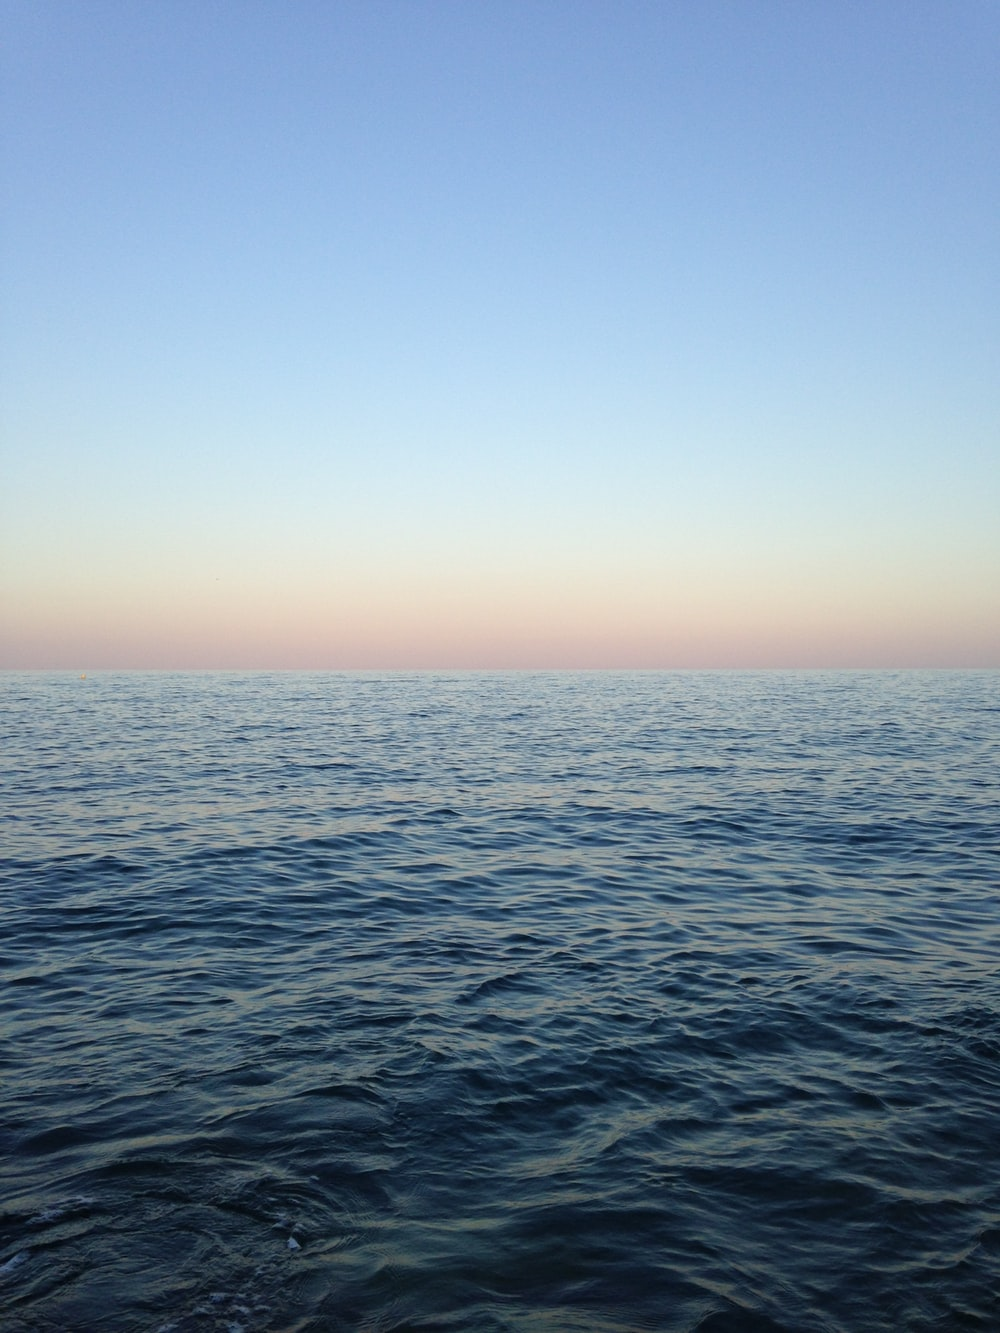 ocean near blue sky at daytime